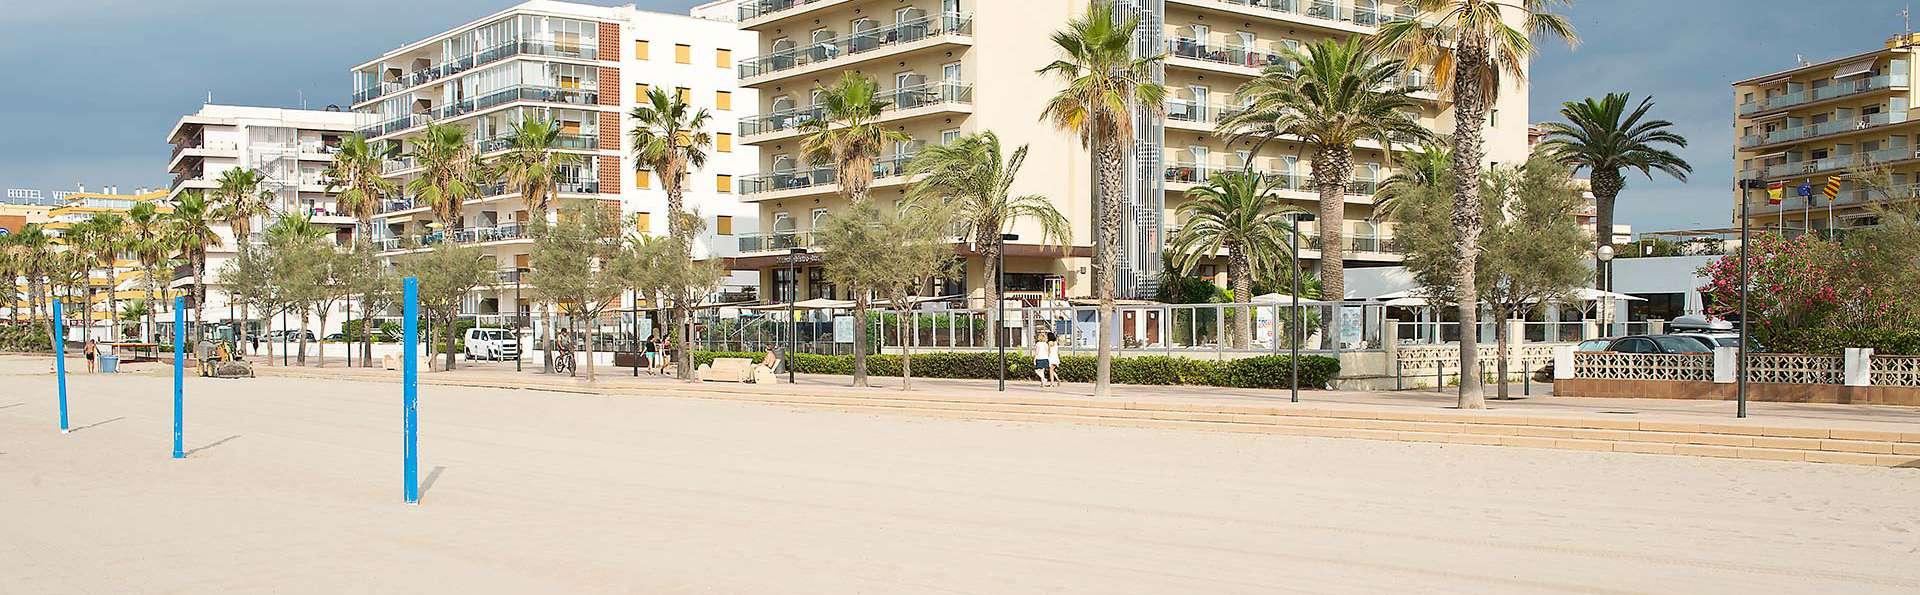 Hotel Monterrey Roses by Pierre & Vacances - EDIT_N2_FRONT_02.jpg